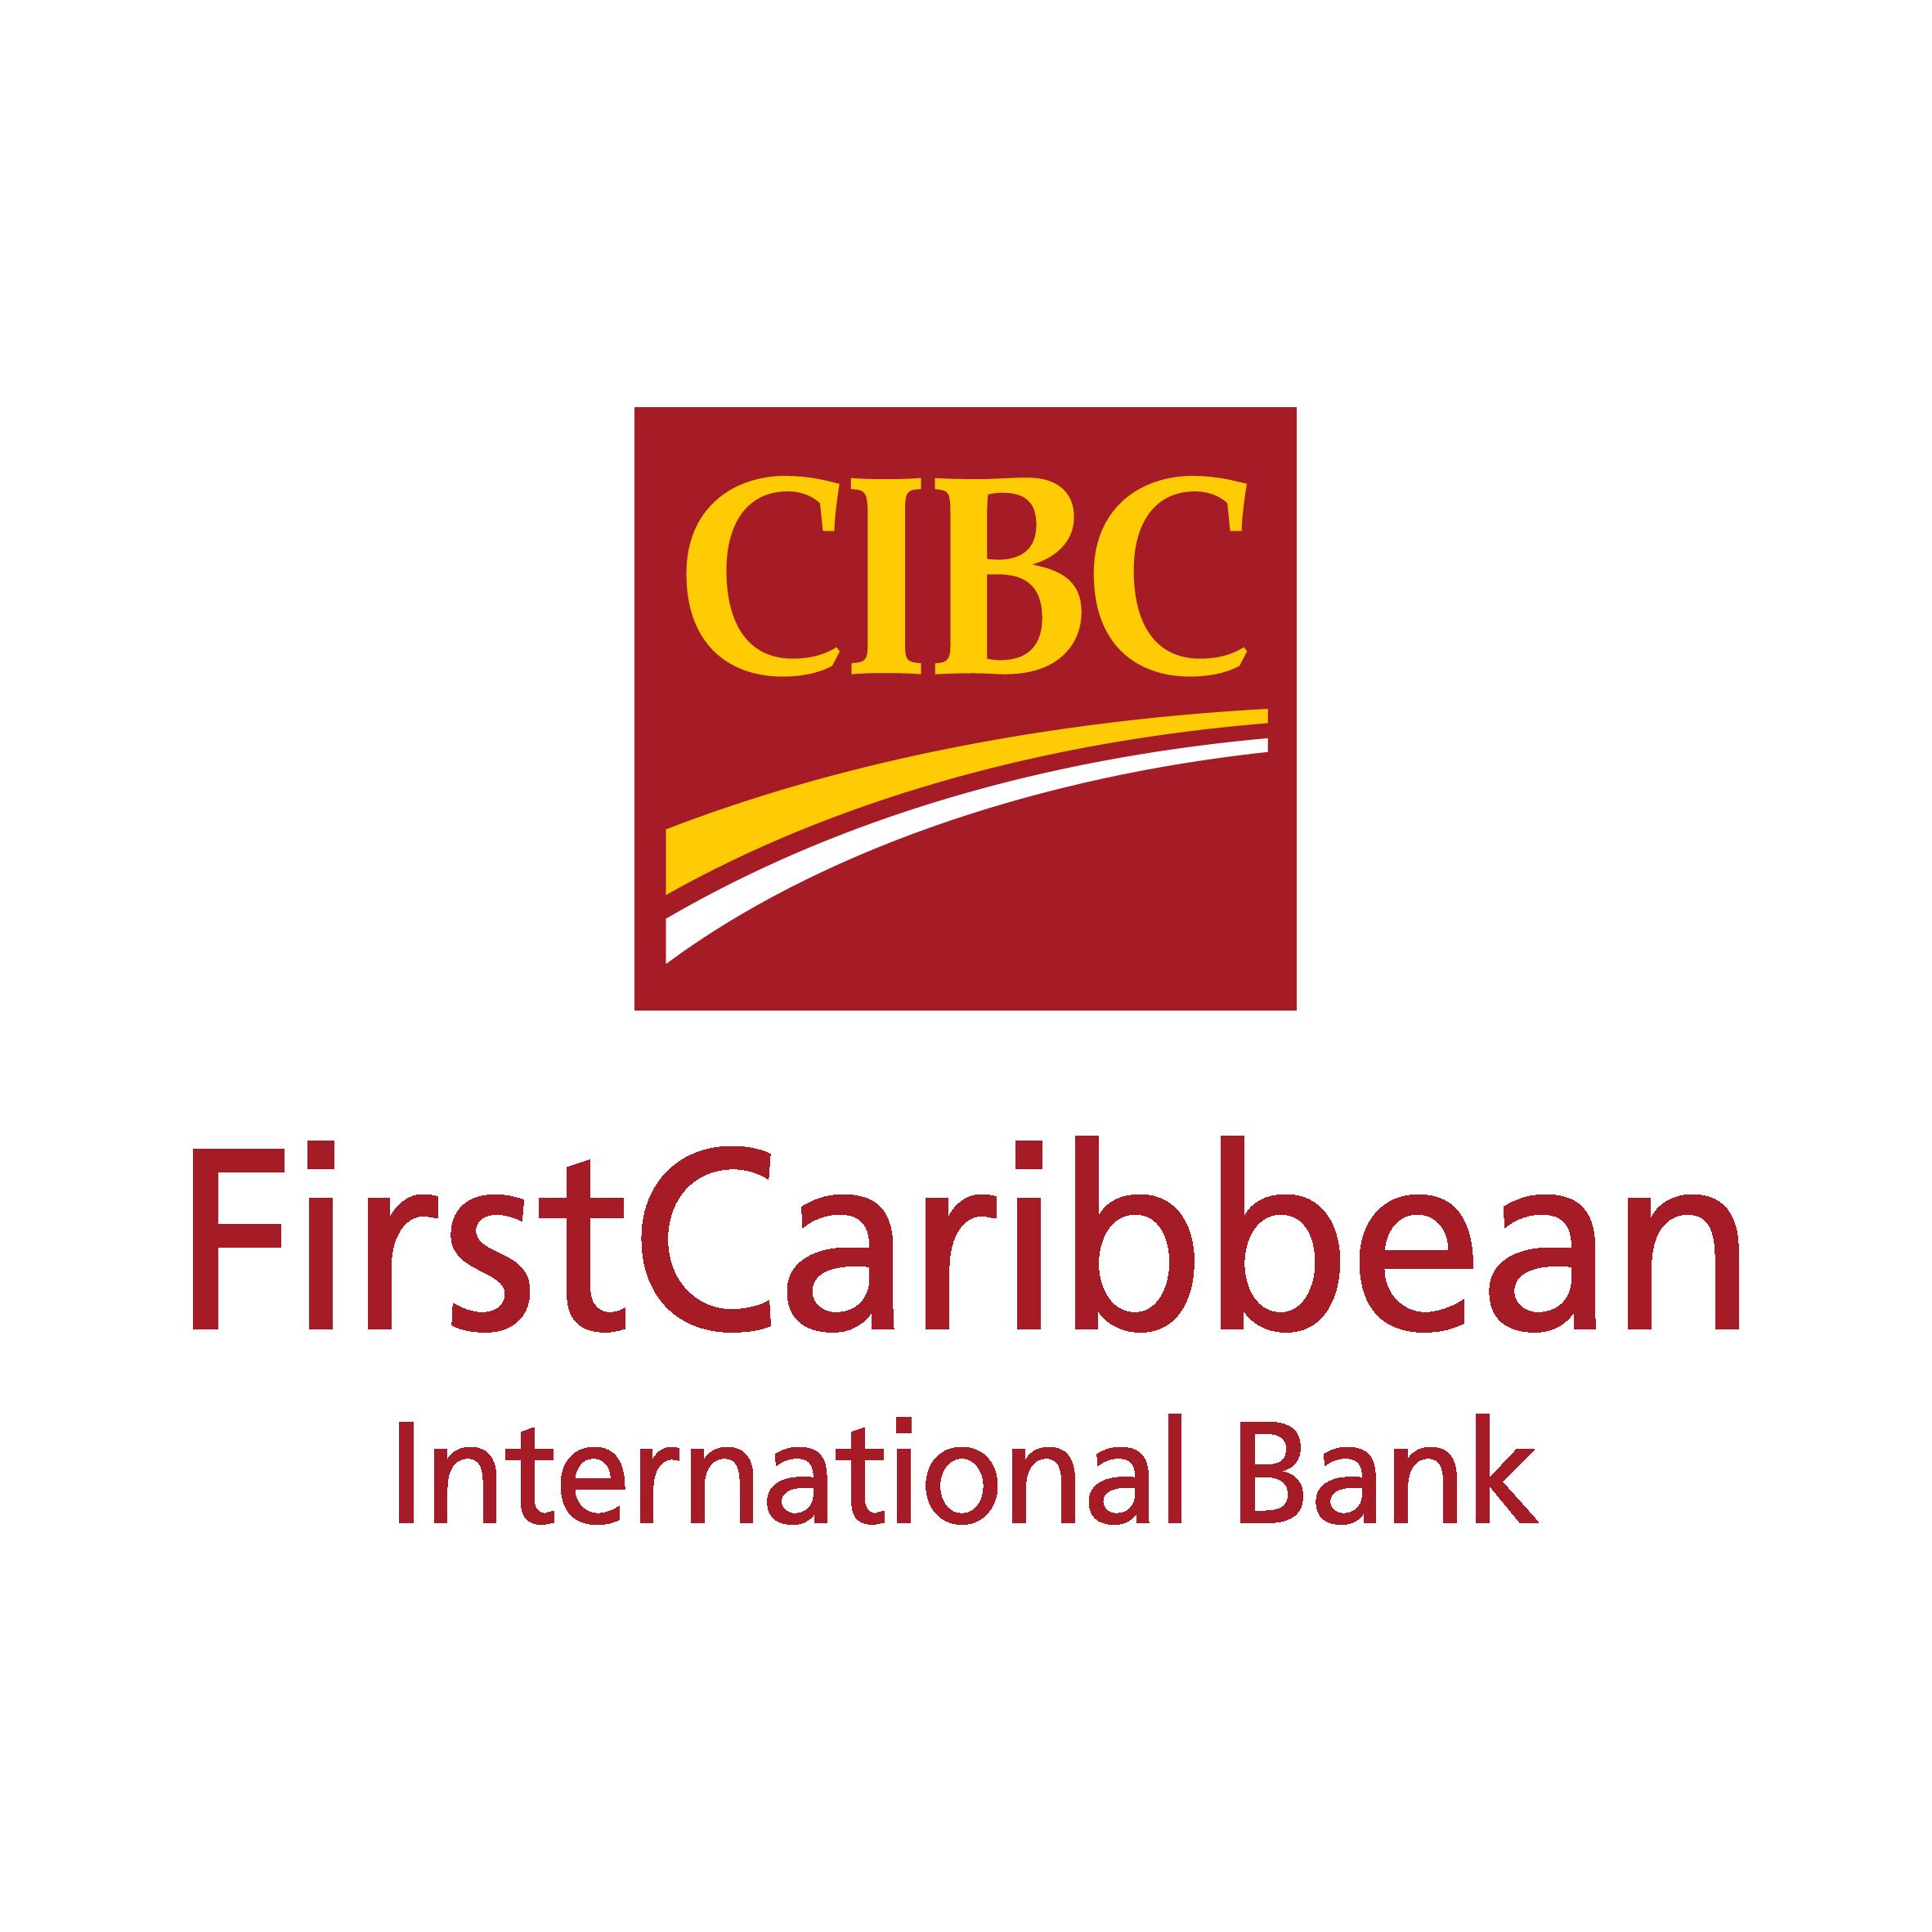 First Caribbean International Bank logo.